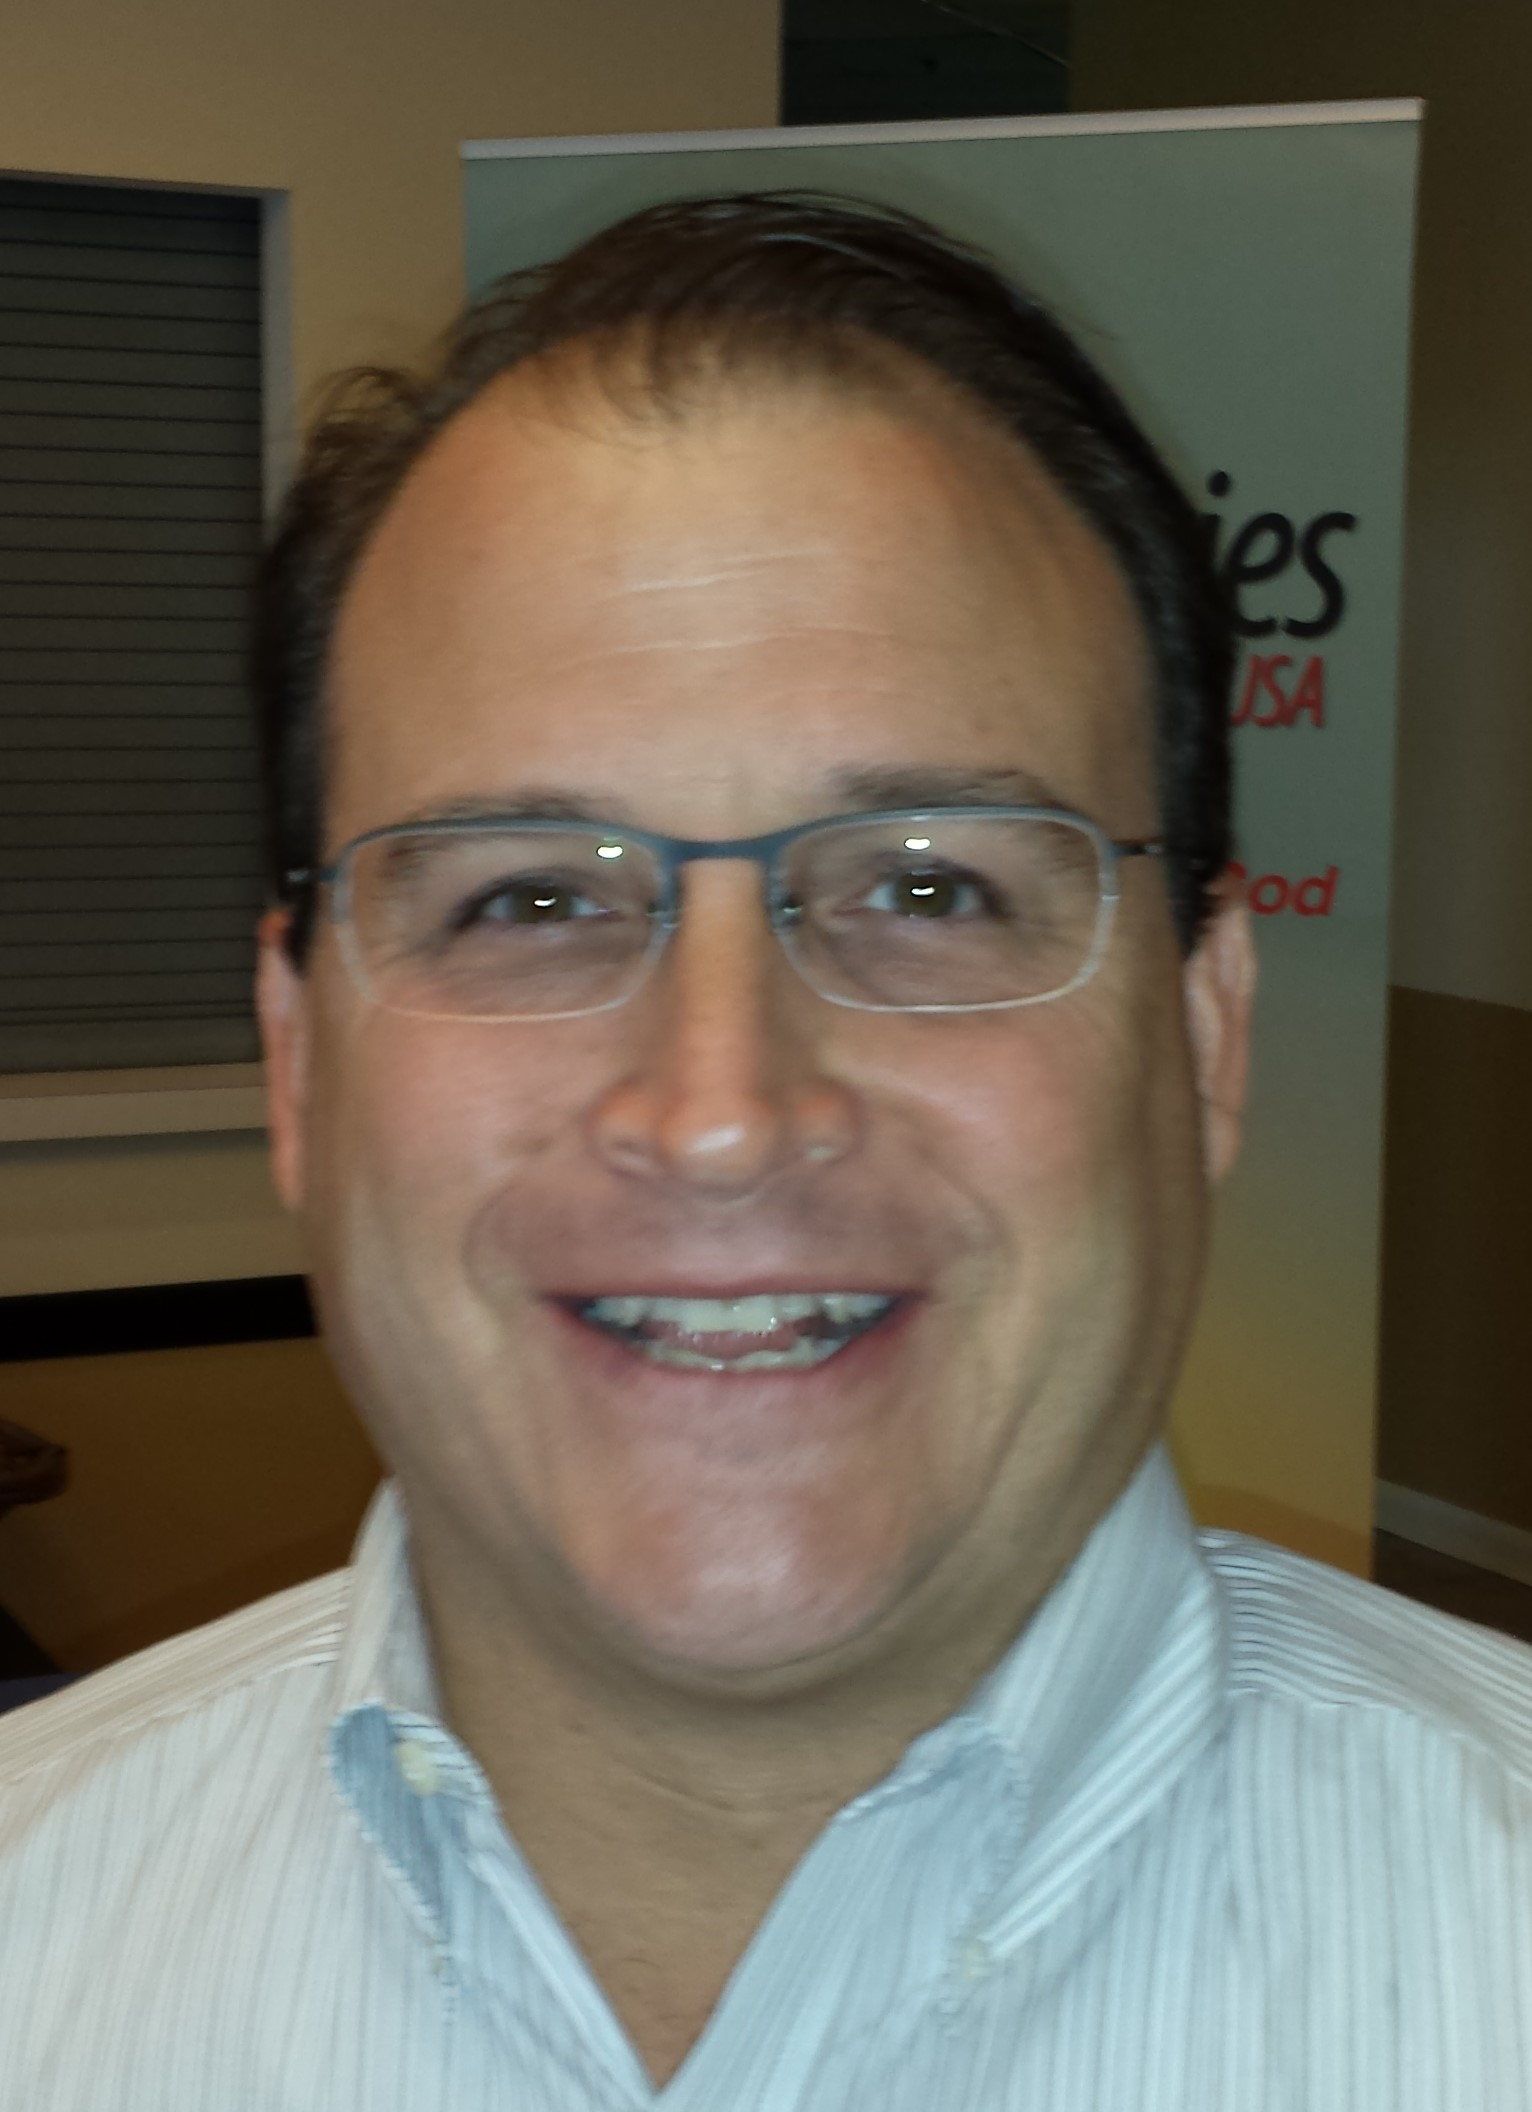 Pastor Nick Plummer